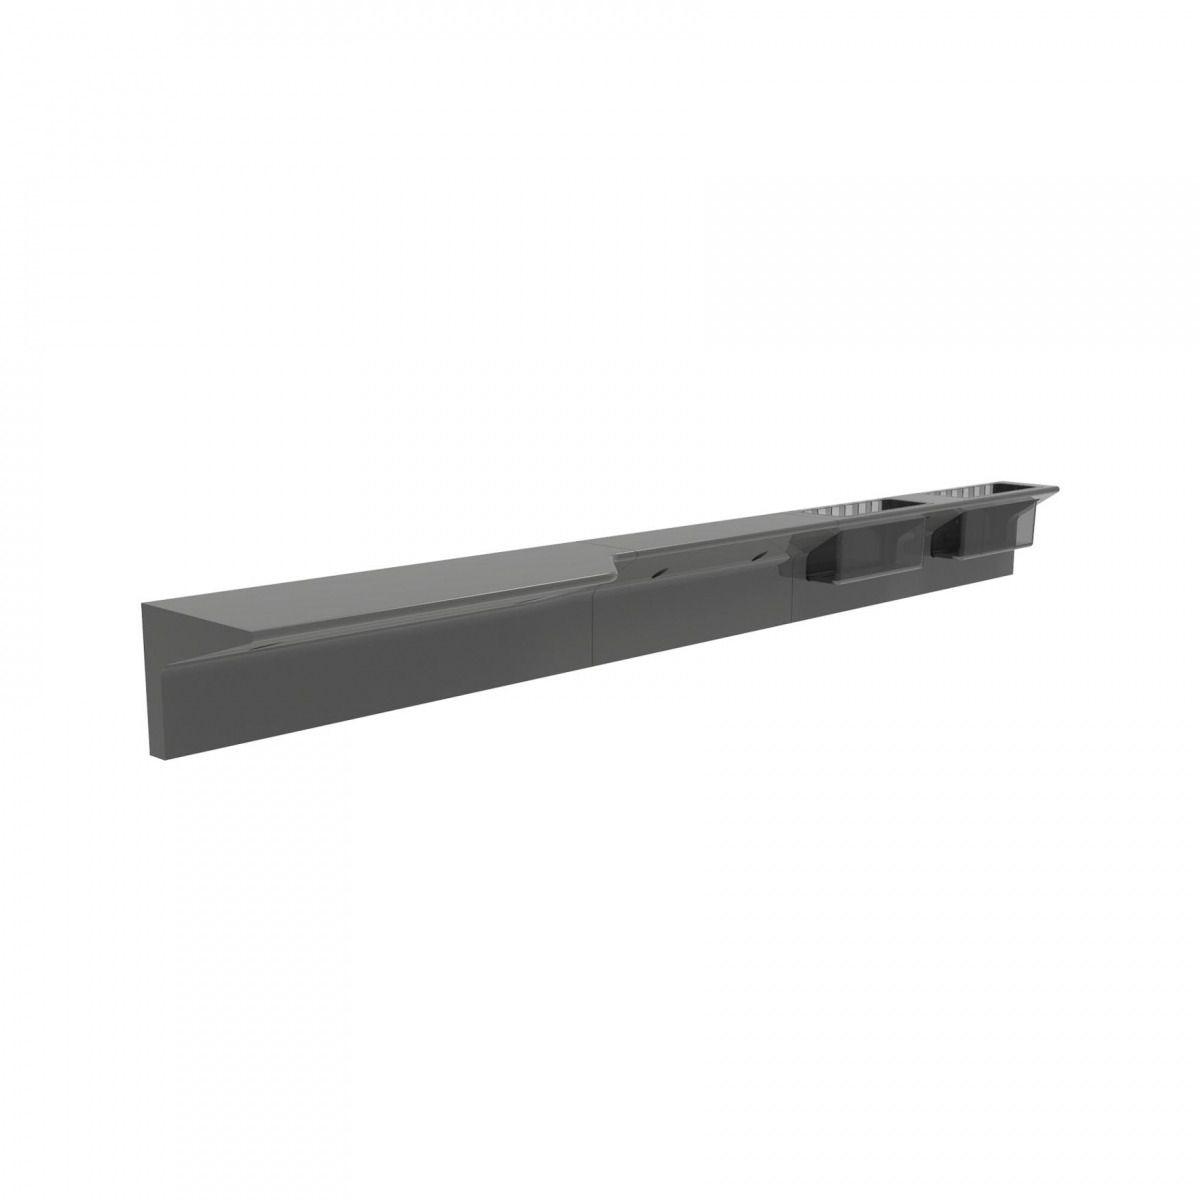 Bancada Inteligente BI120G 120 cm